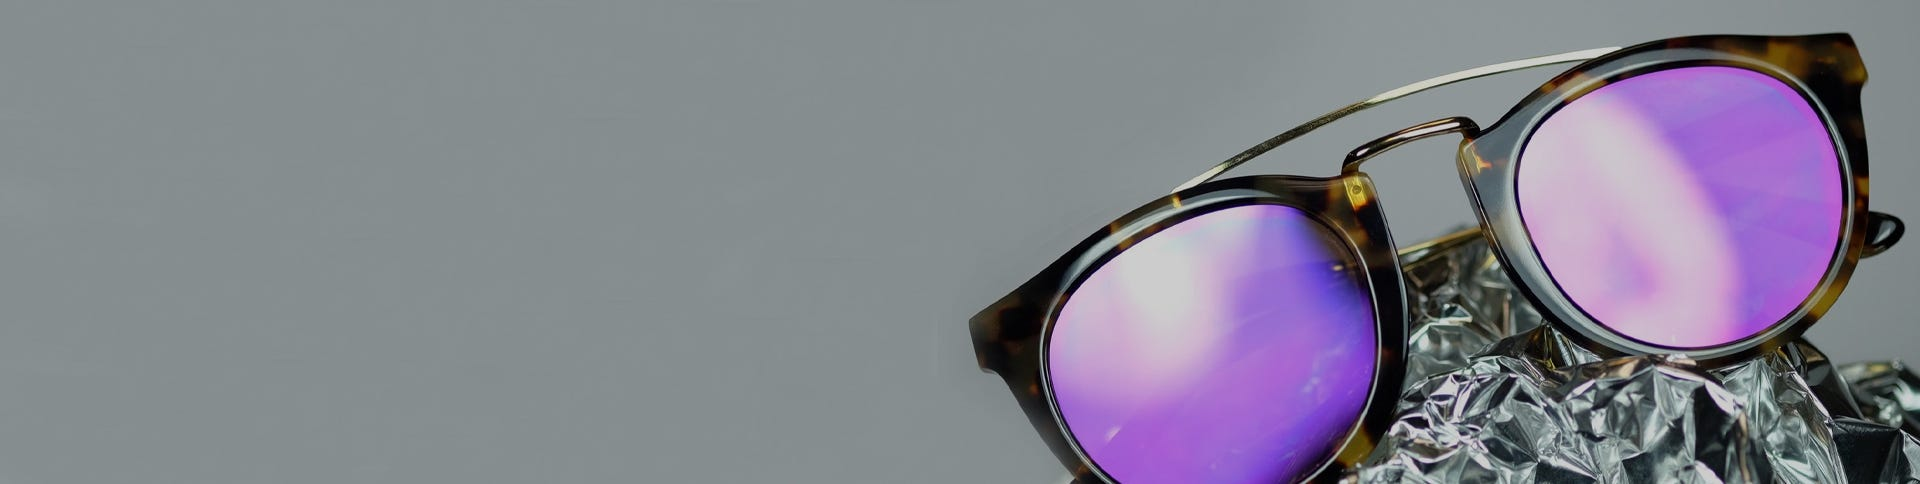 lyndon-leone-eyewear-oculos-iguatemi365